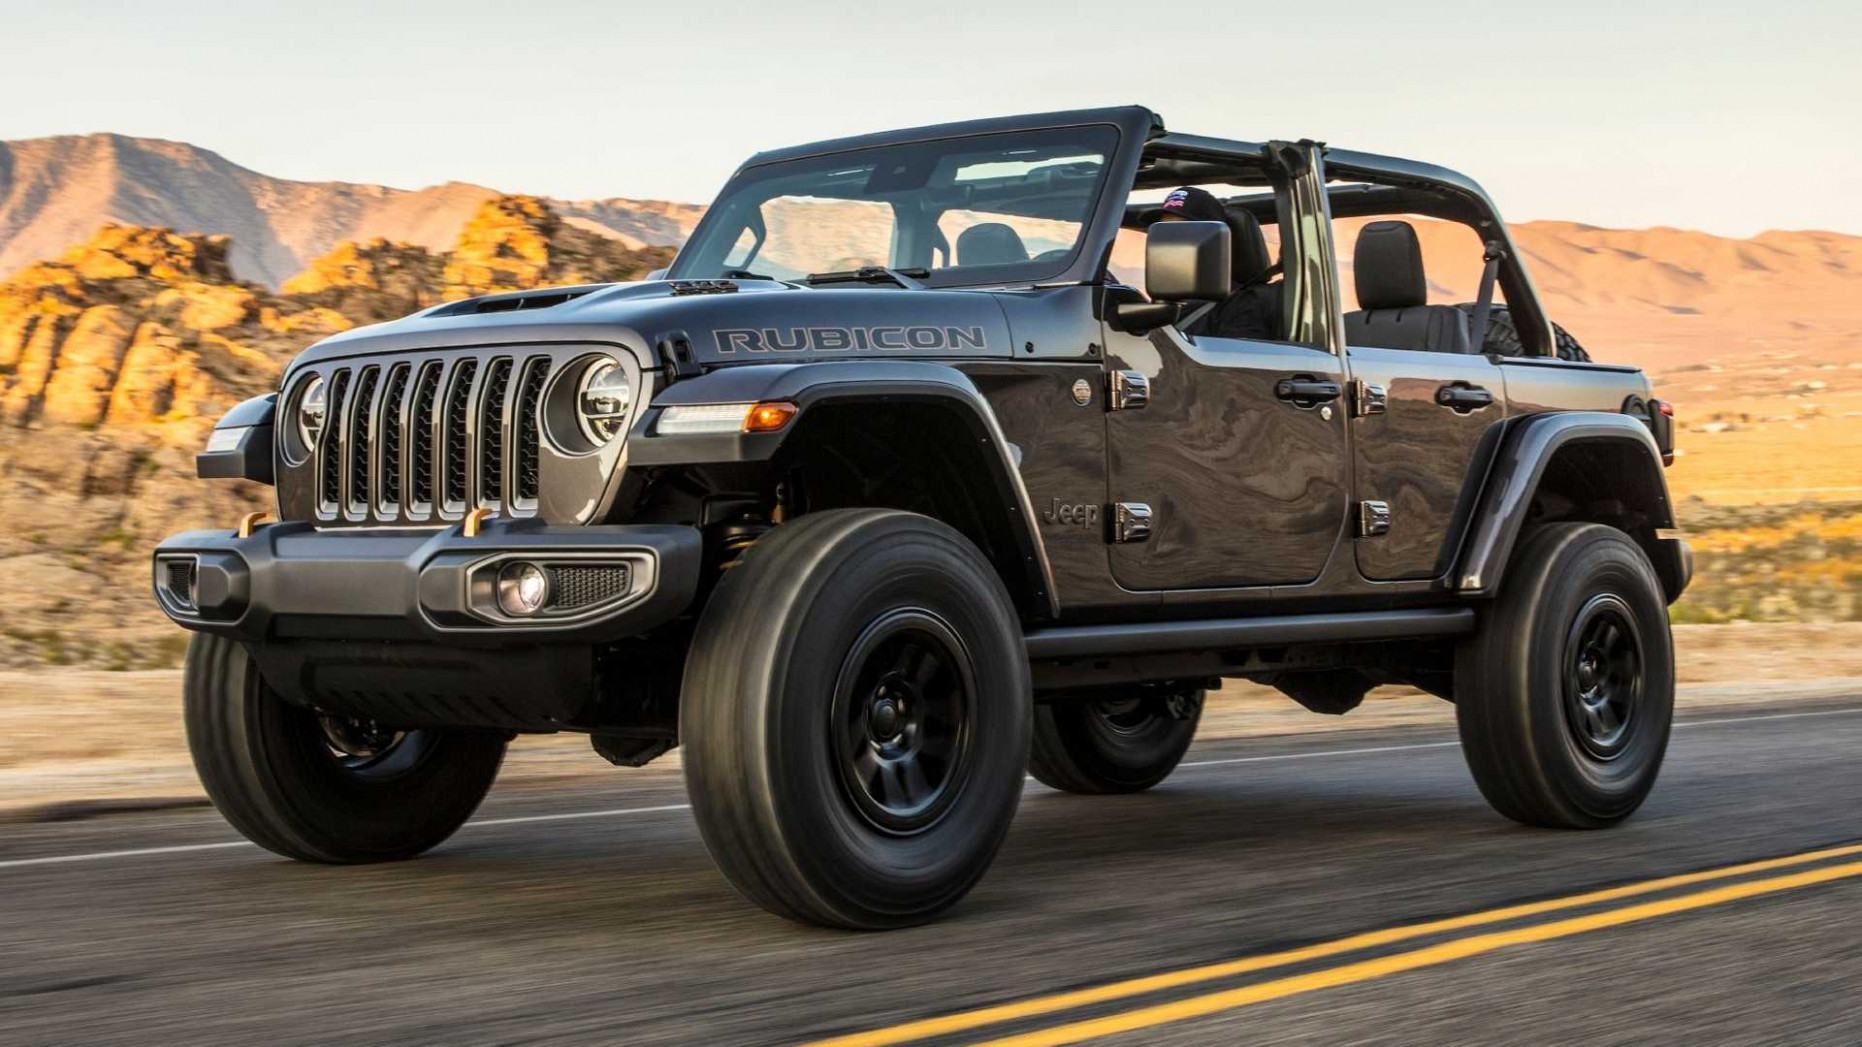 Model Jeep Wrangler Rubicon 2022